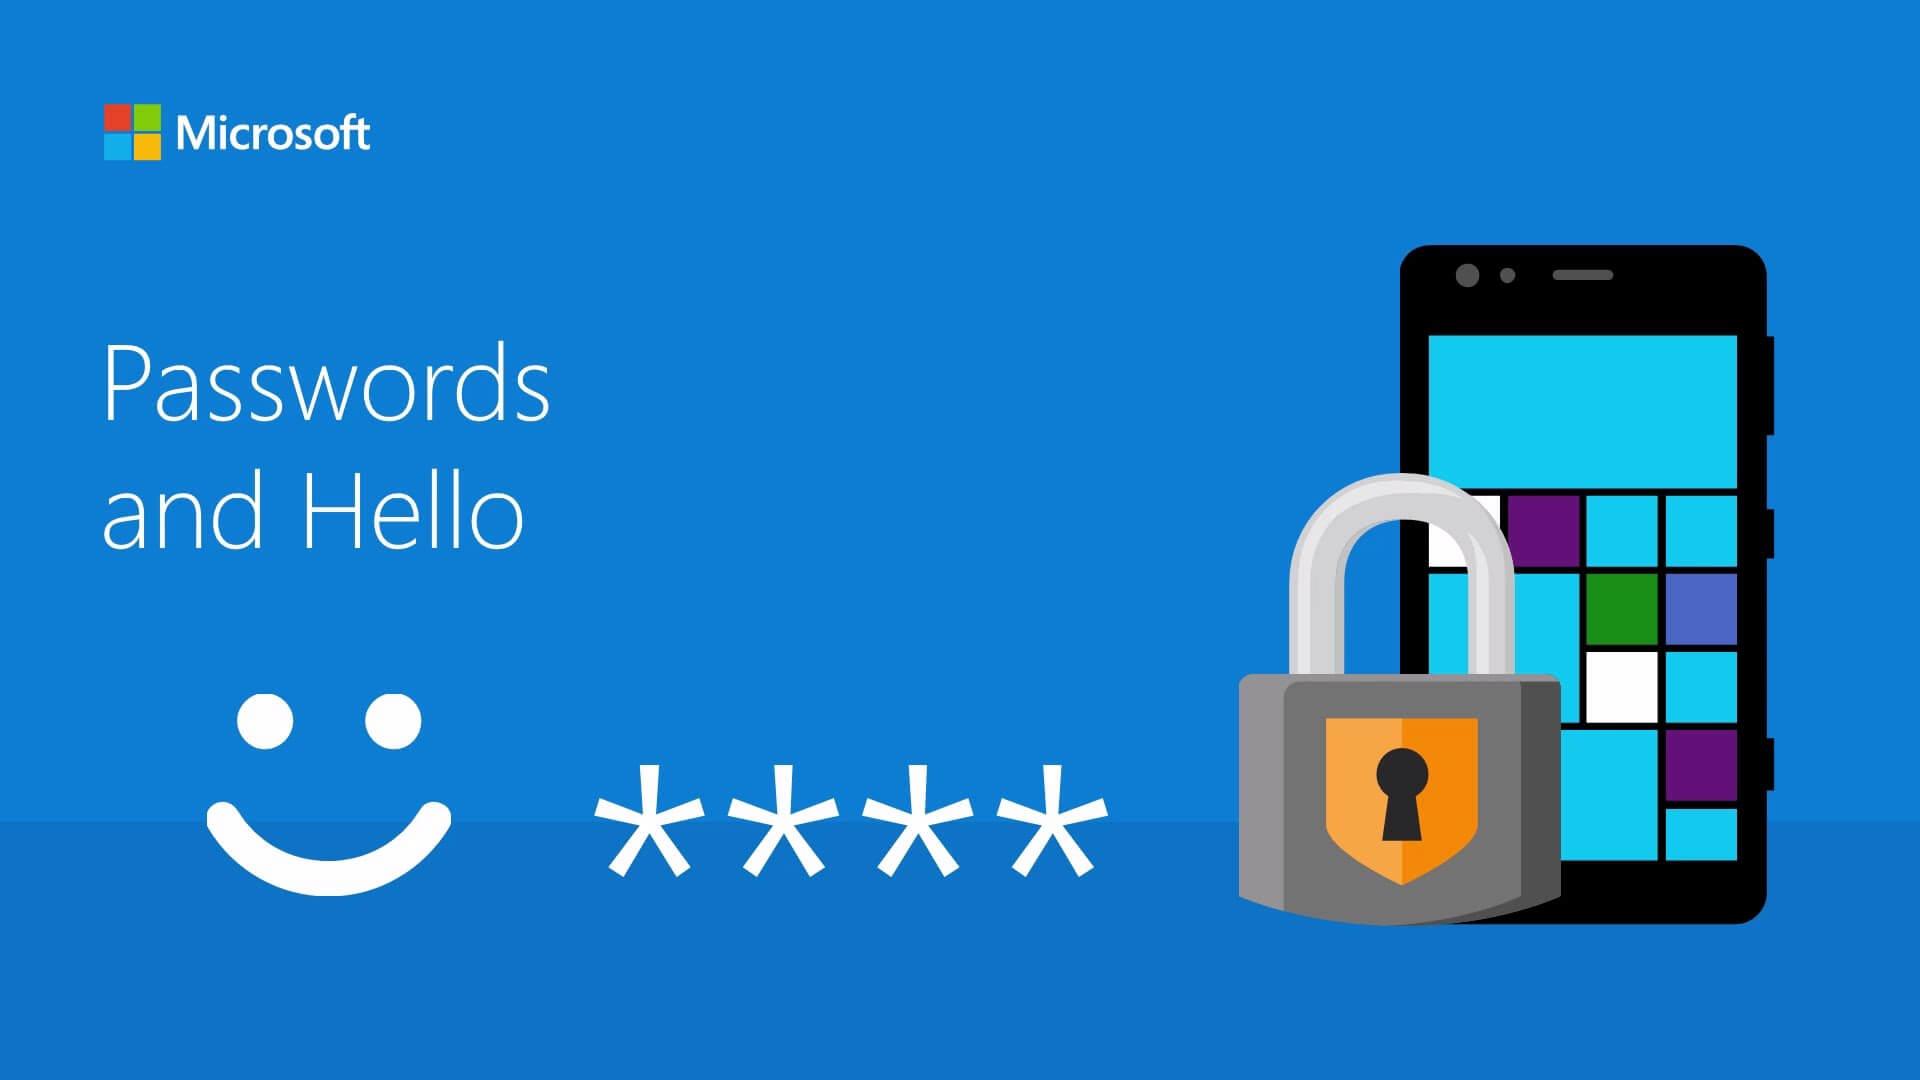 Download Windows 10 Full ISO bản chính thức từ Microsoft Google Drive Link window hello - Download Windows 10 Full ISO bản chính thức từ Microsoft (Google Drive Link)